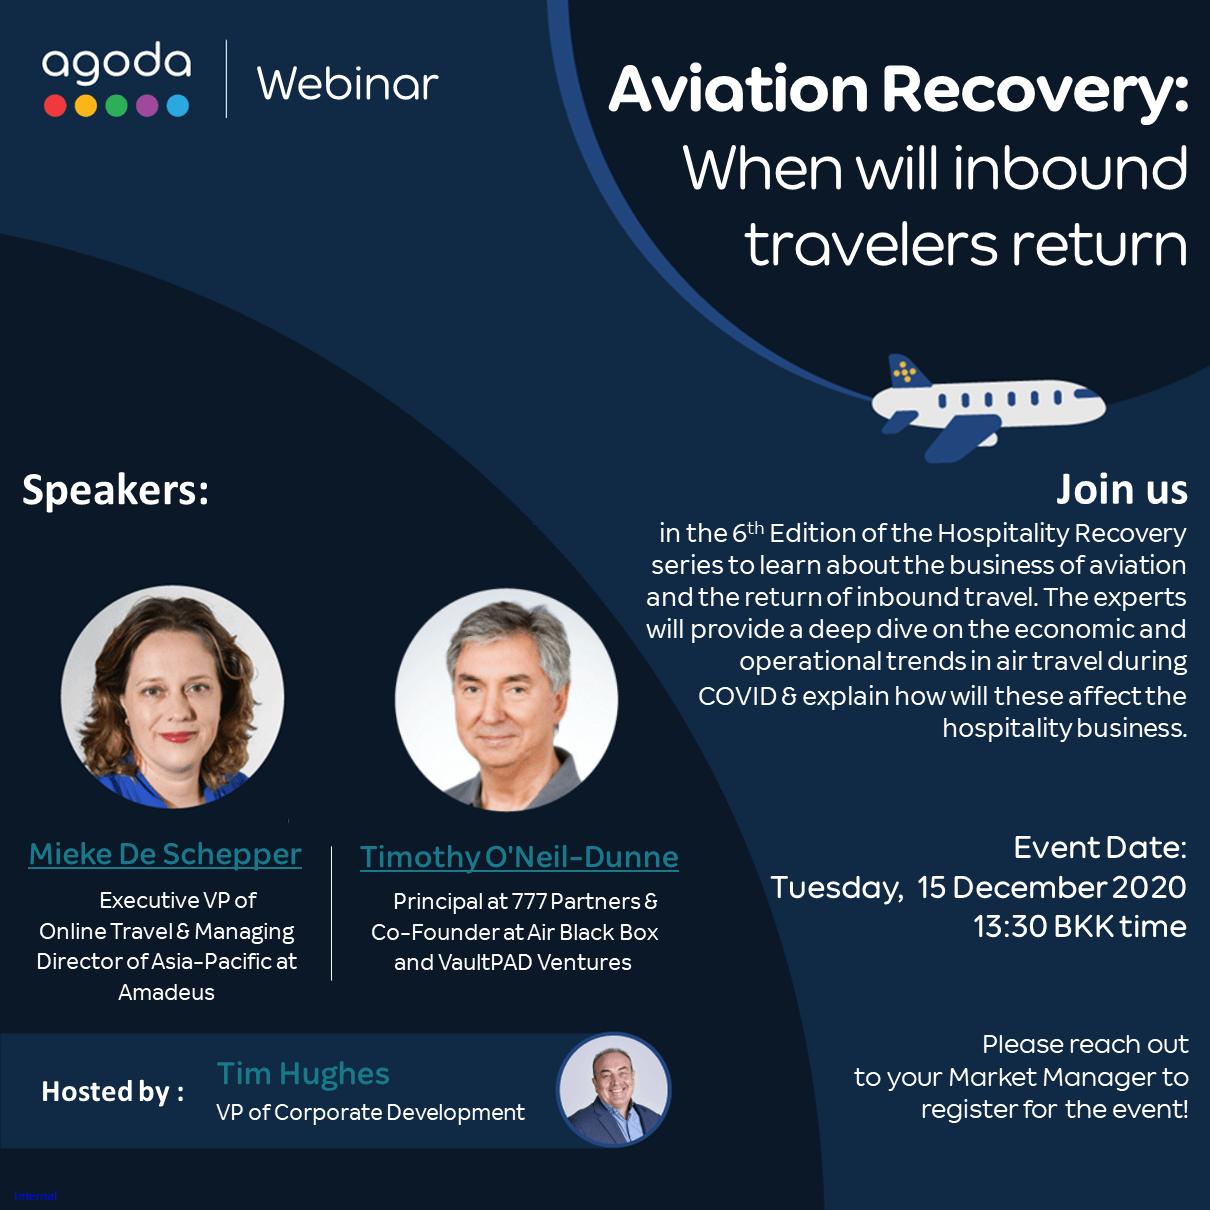 December 15, 2020 Agoda Webinar / Aviation Recovery: When will inbound travelers return